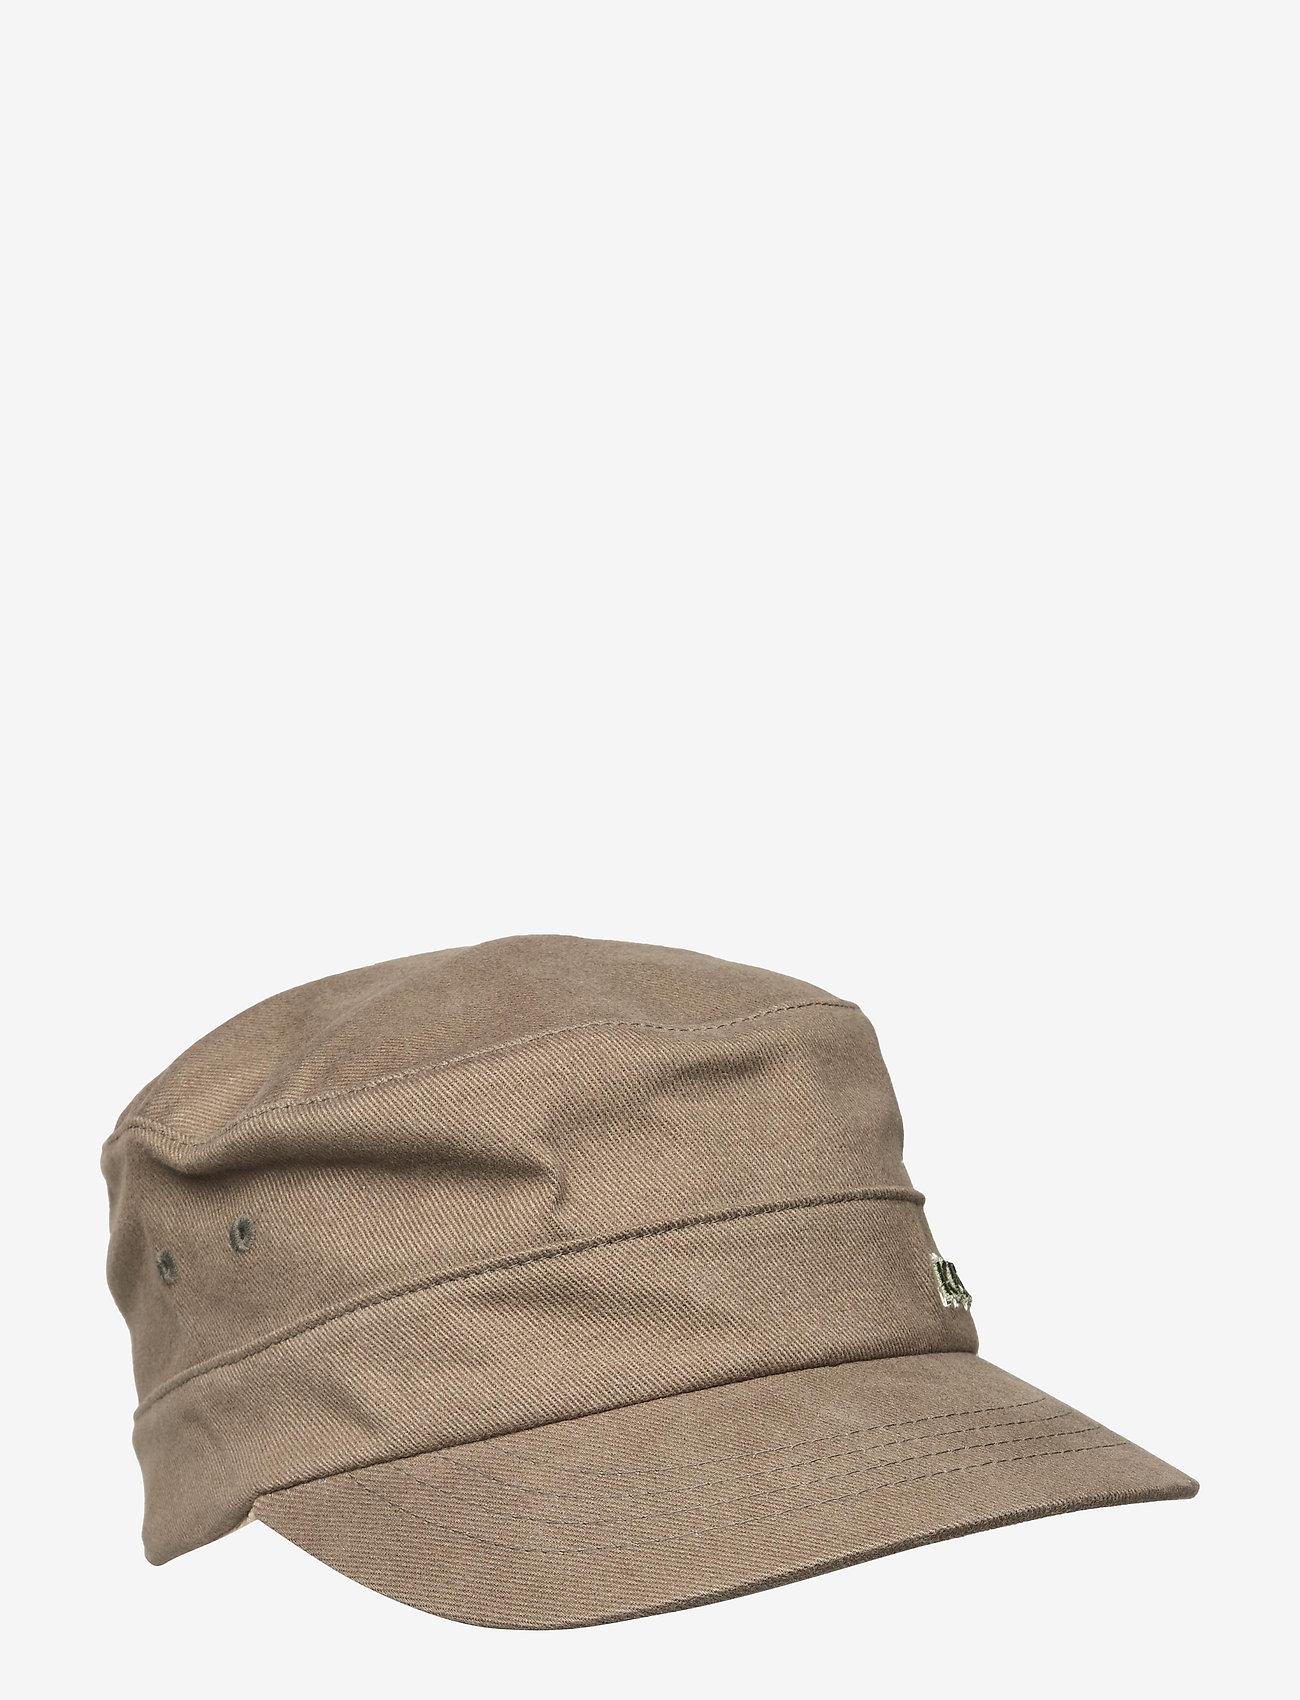 Kangol - KG COTTON TWILL ARMY CAP - kasketter - green - 0